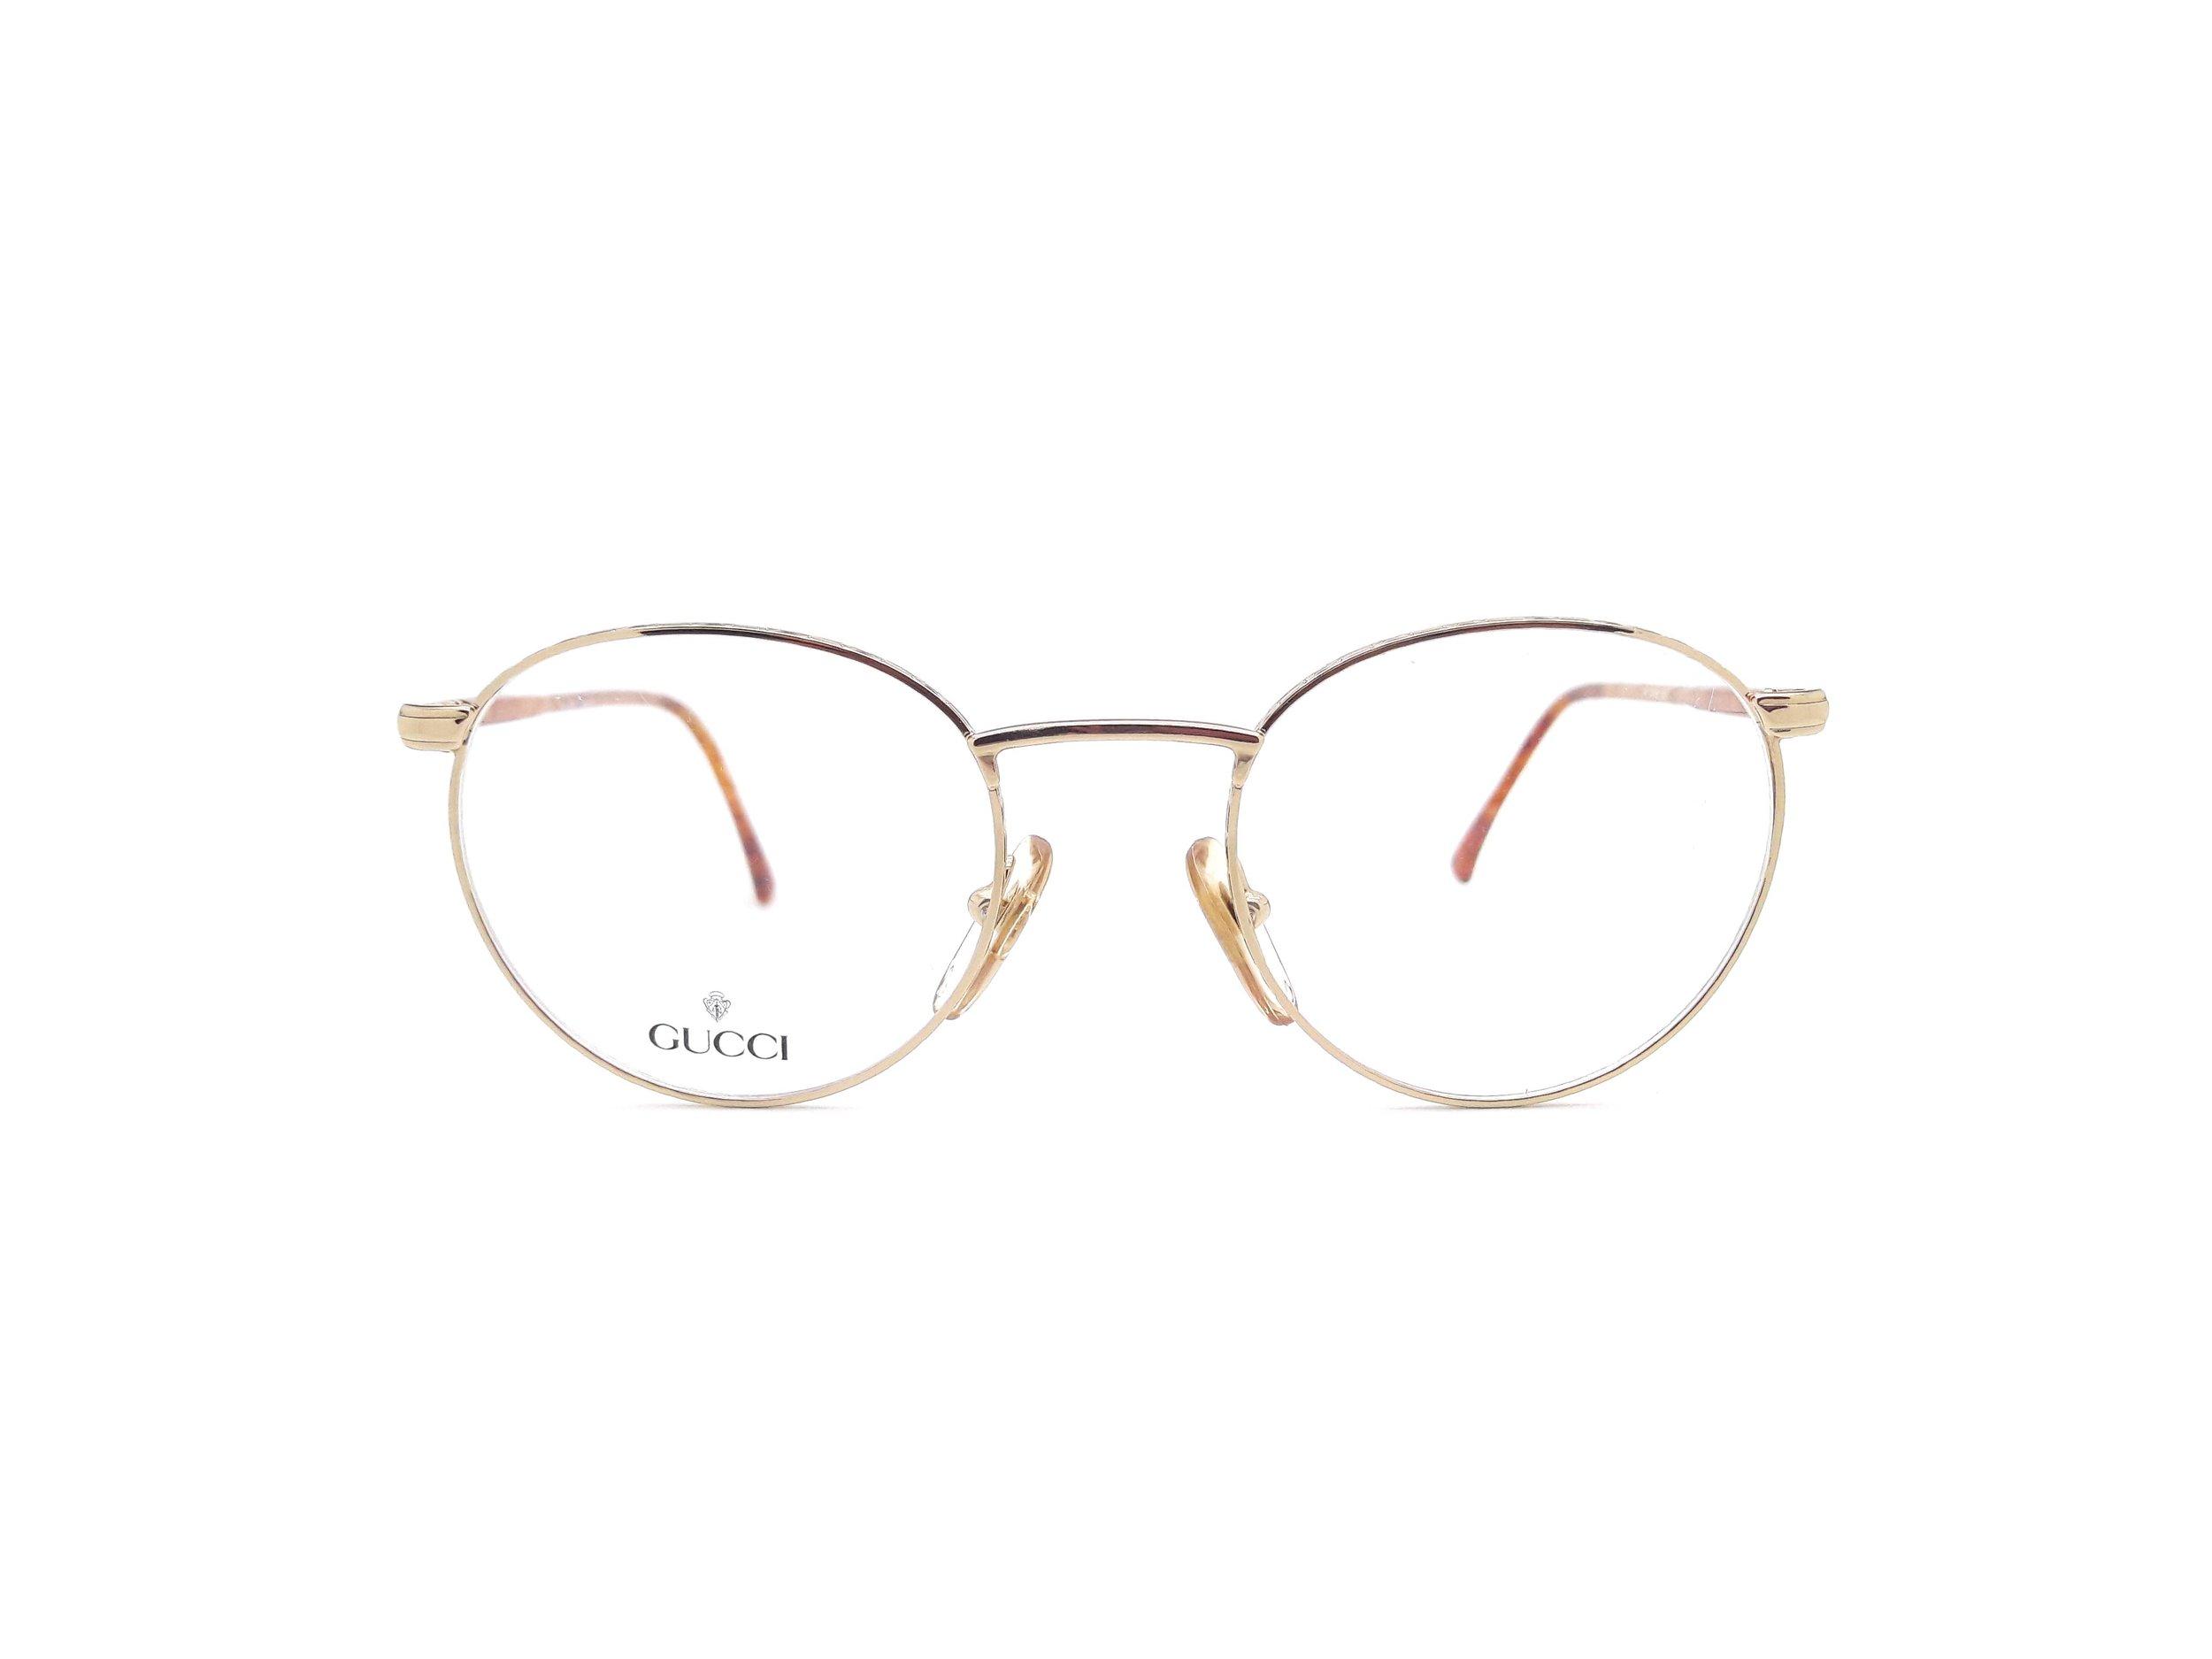 Gucci GG 1242 Vintage Glasses — Ed & Sarna Vintage Eyewear